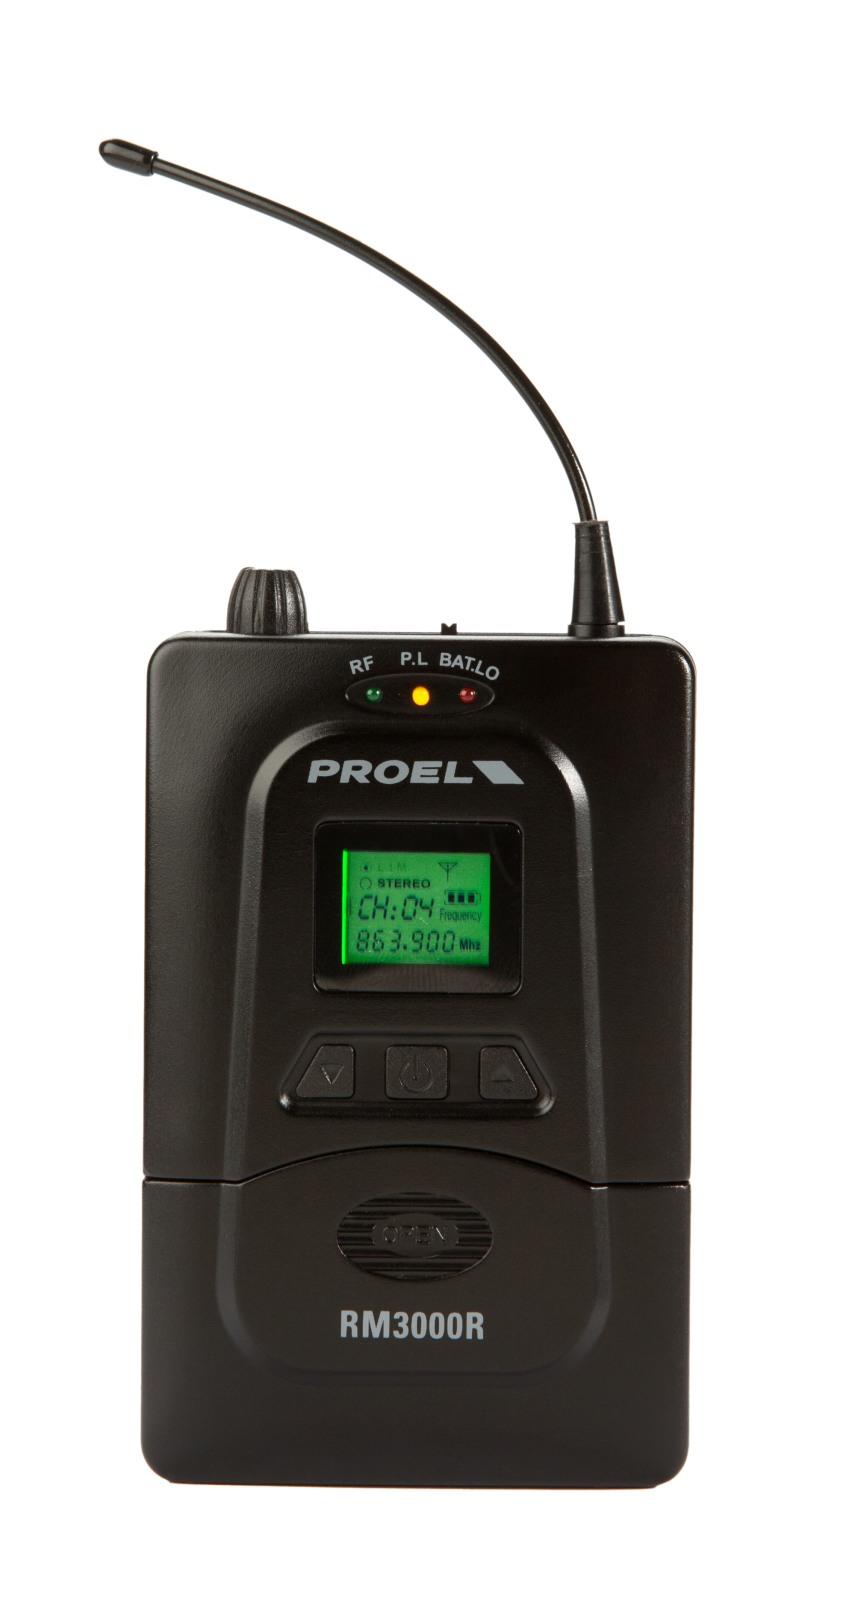 PROEL RM3000R - PLL UHF In-ear Wireless Receiver